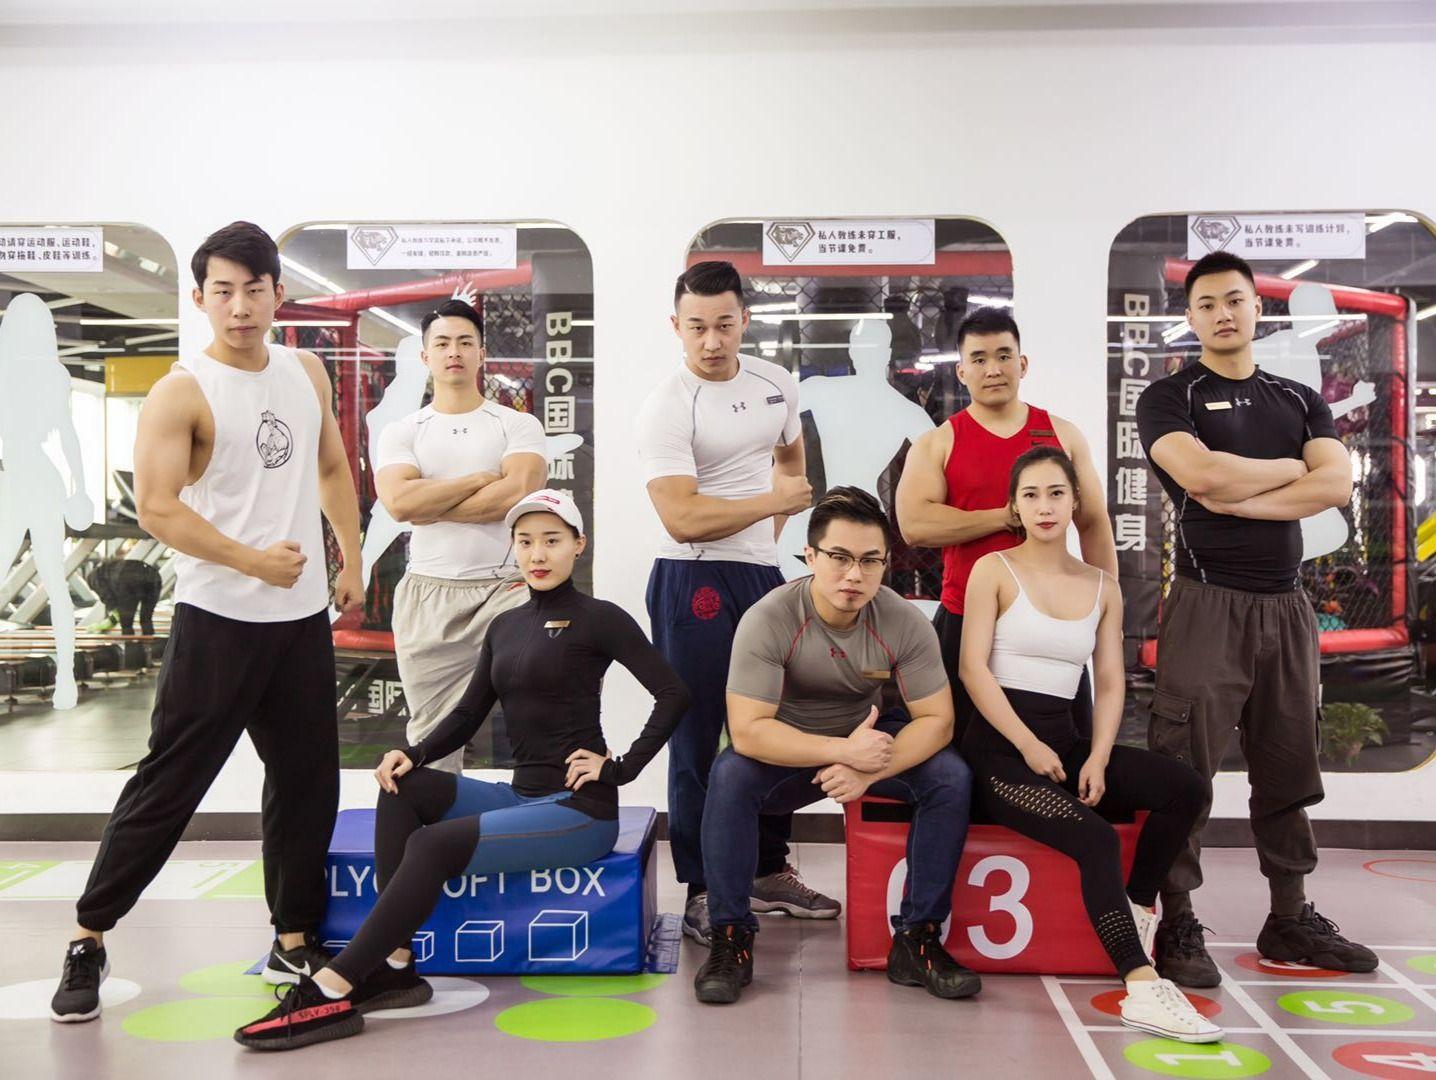 BBC大型健身搏击私教工作室(新街口店)